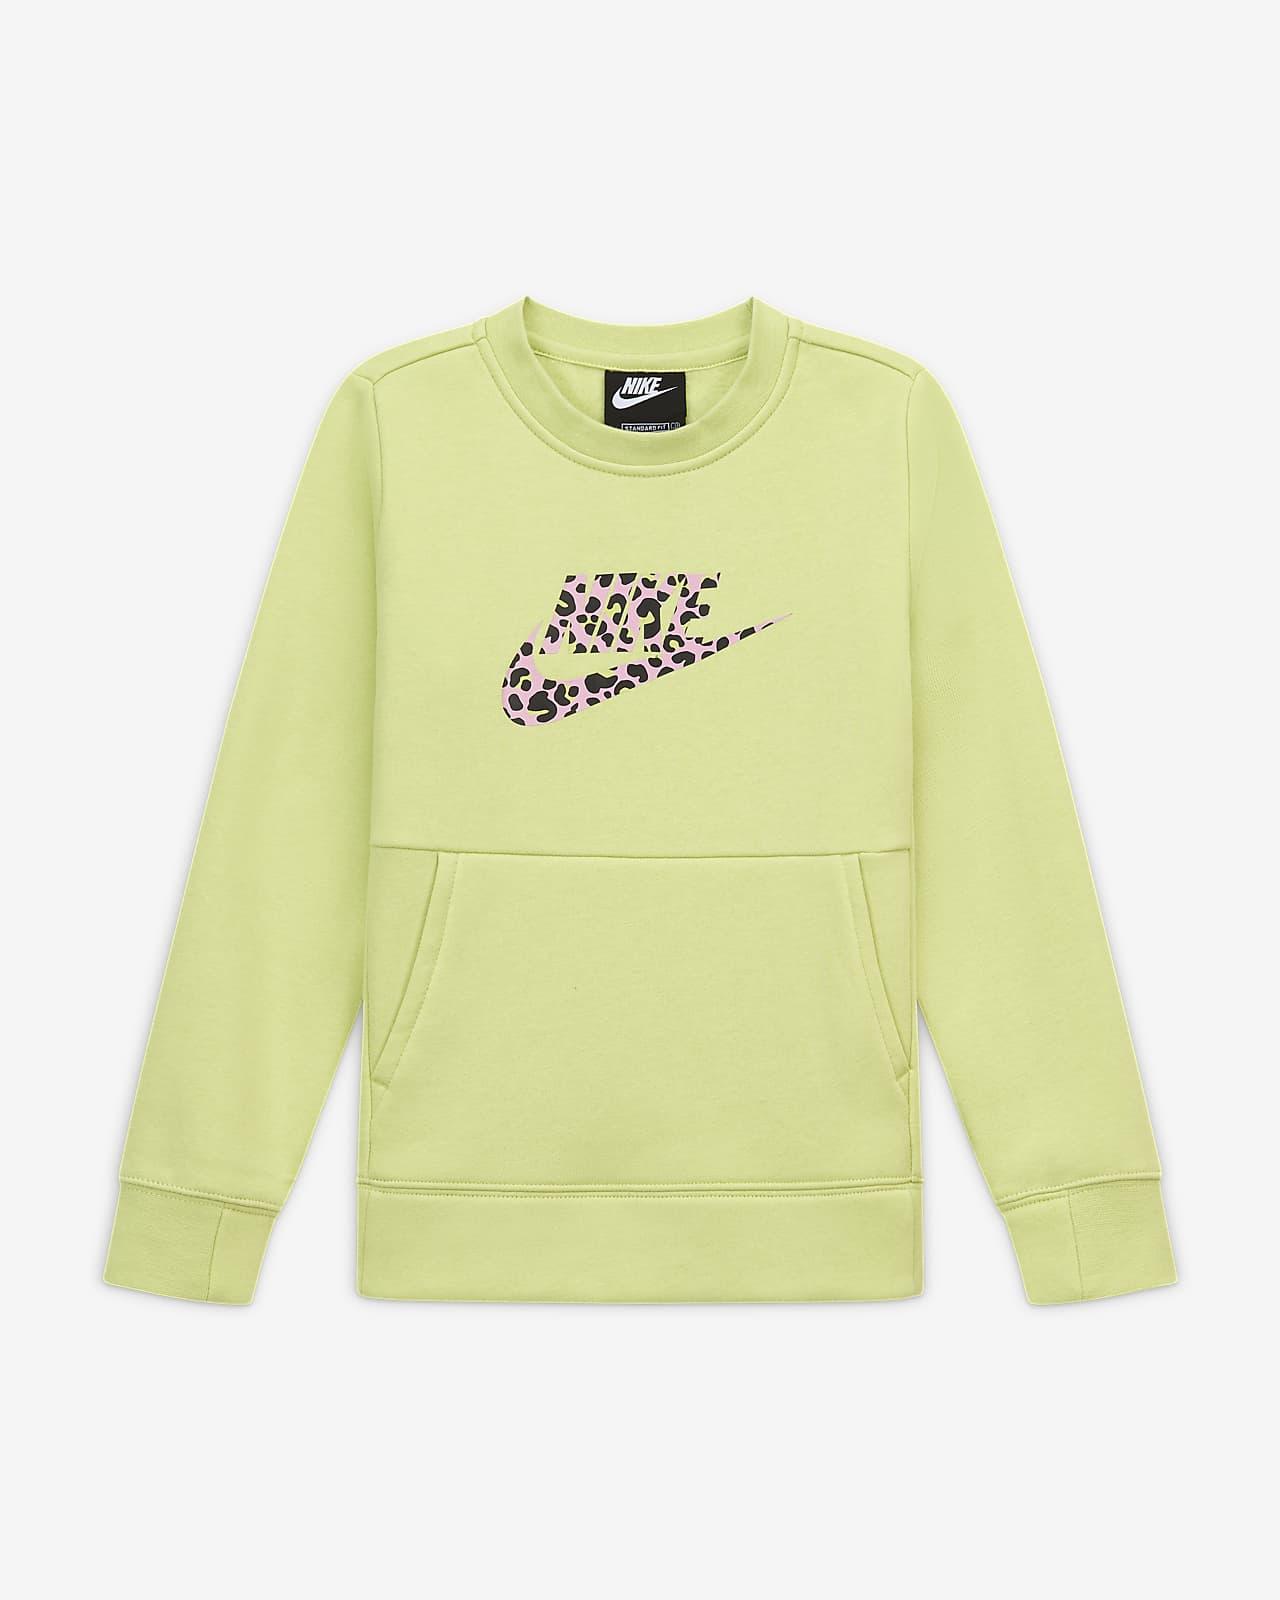 Haut Nike Sportswear pour Fille plus âgée